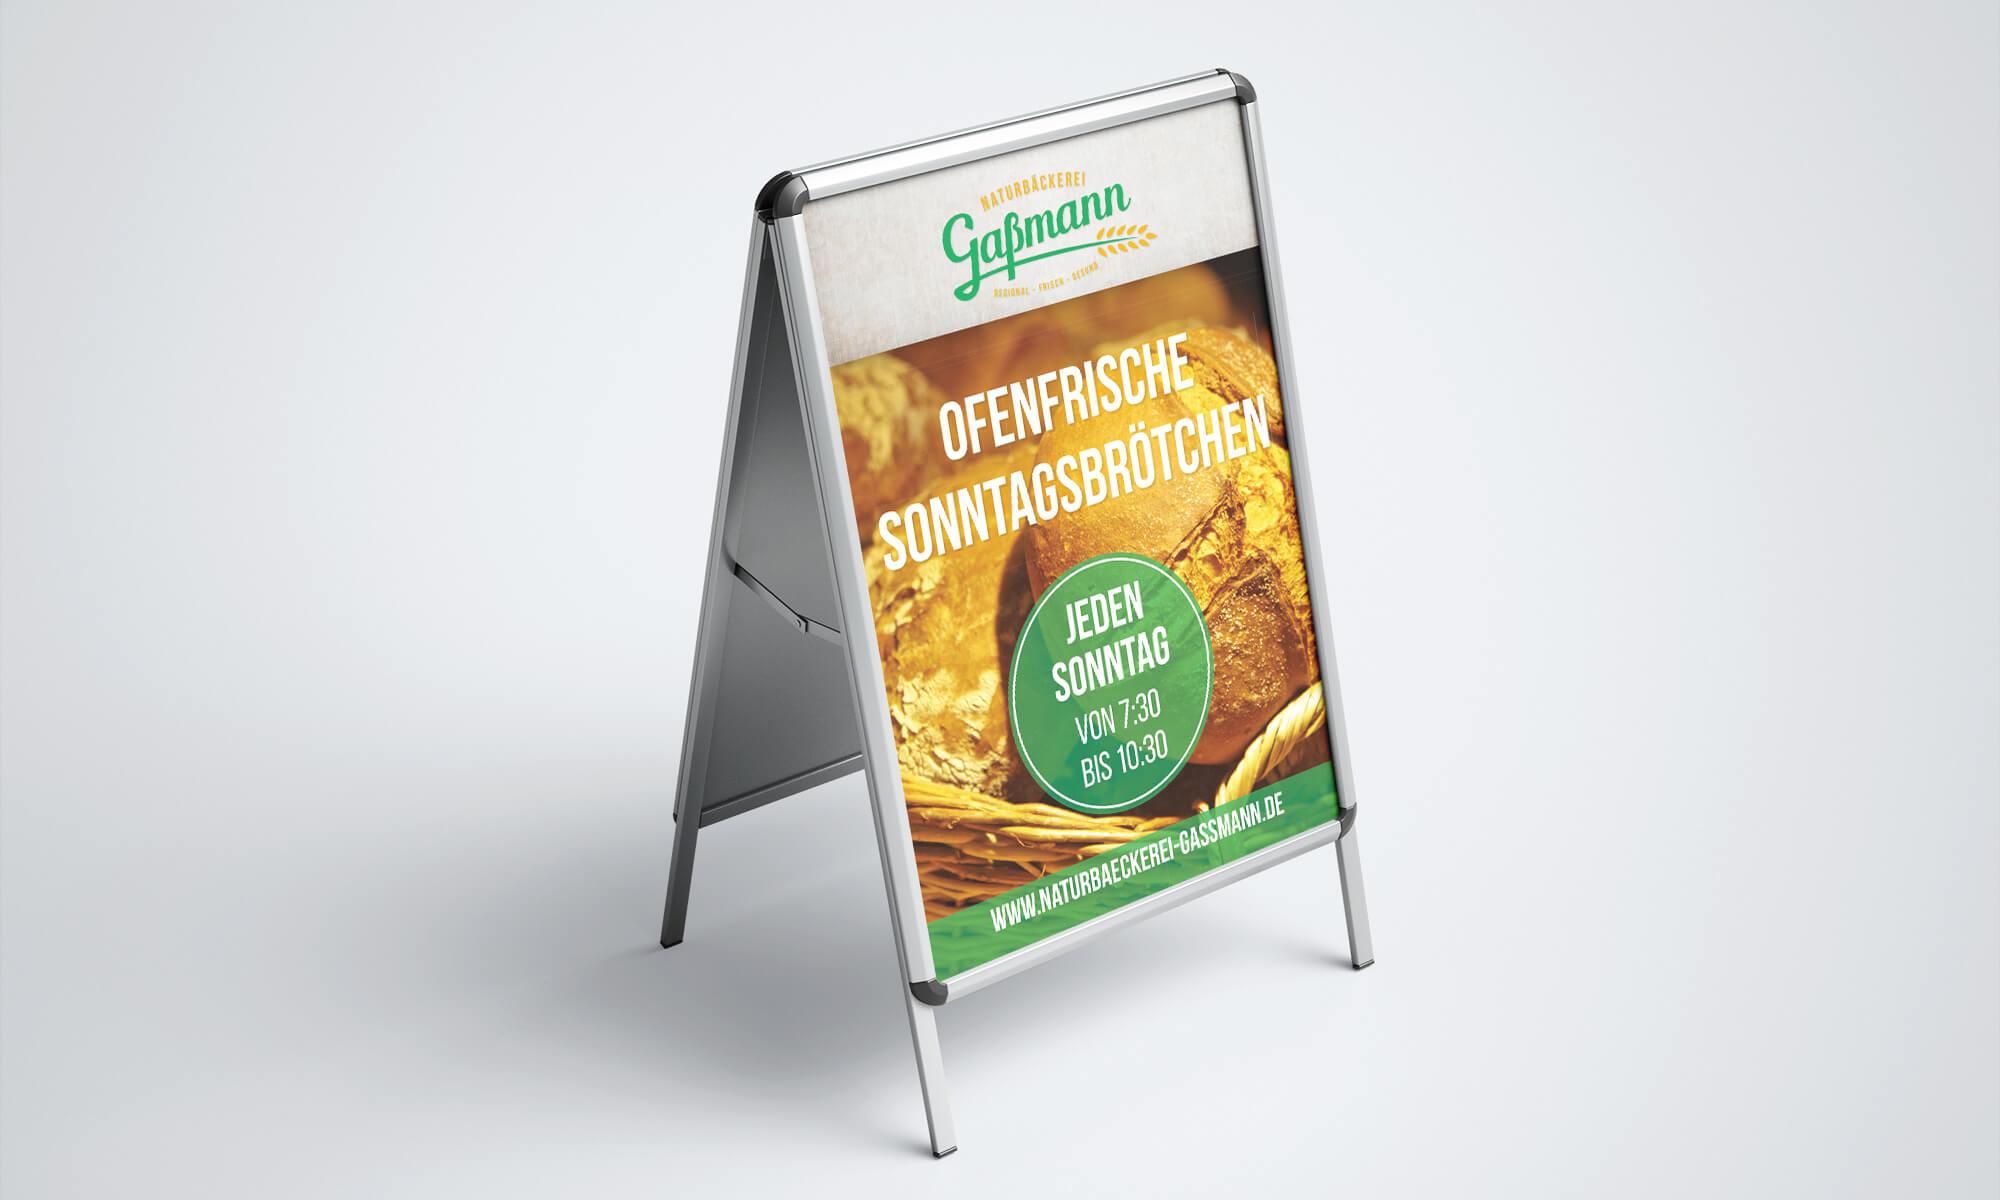 Naturbäckerei Gaßmann - Plakate für den Kundenstopper